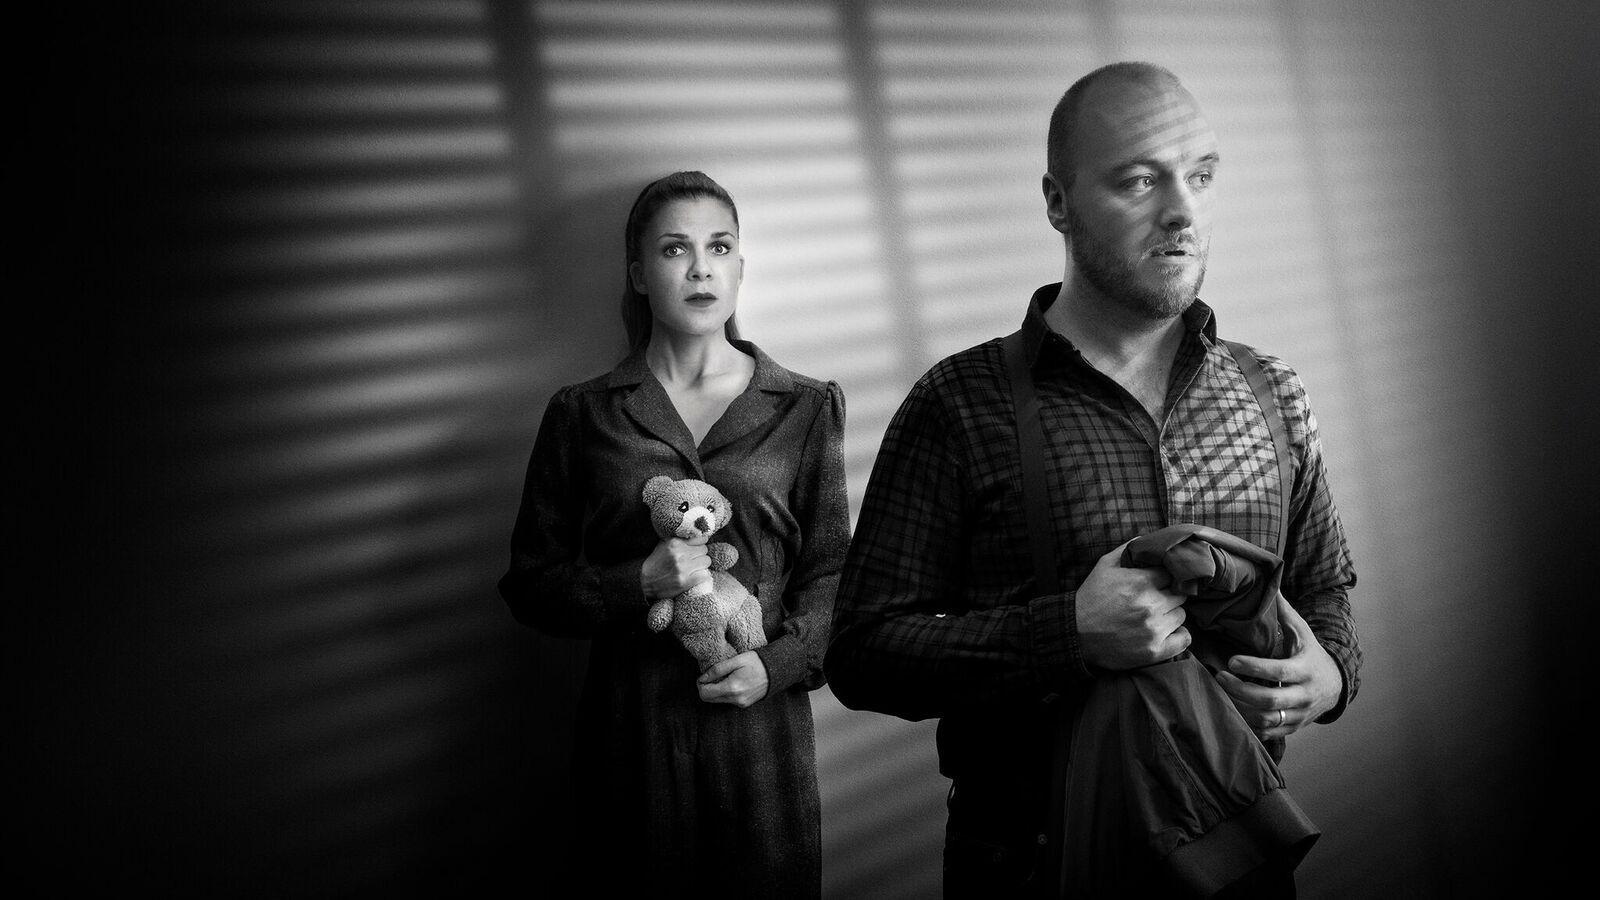 Anmeldelse: T-ERROR, Teater Får302 (gæstespil)